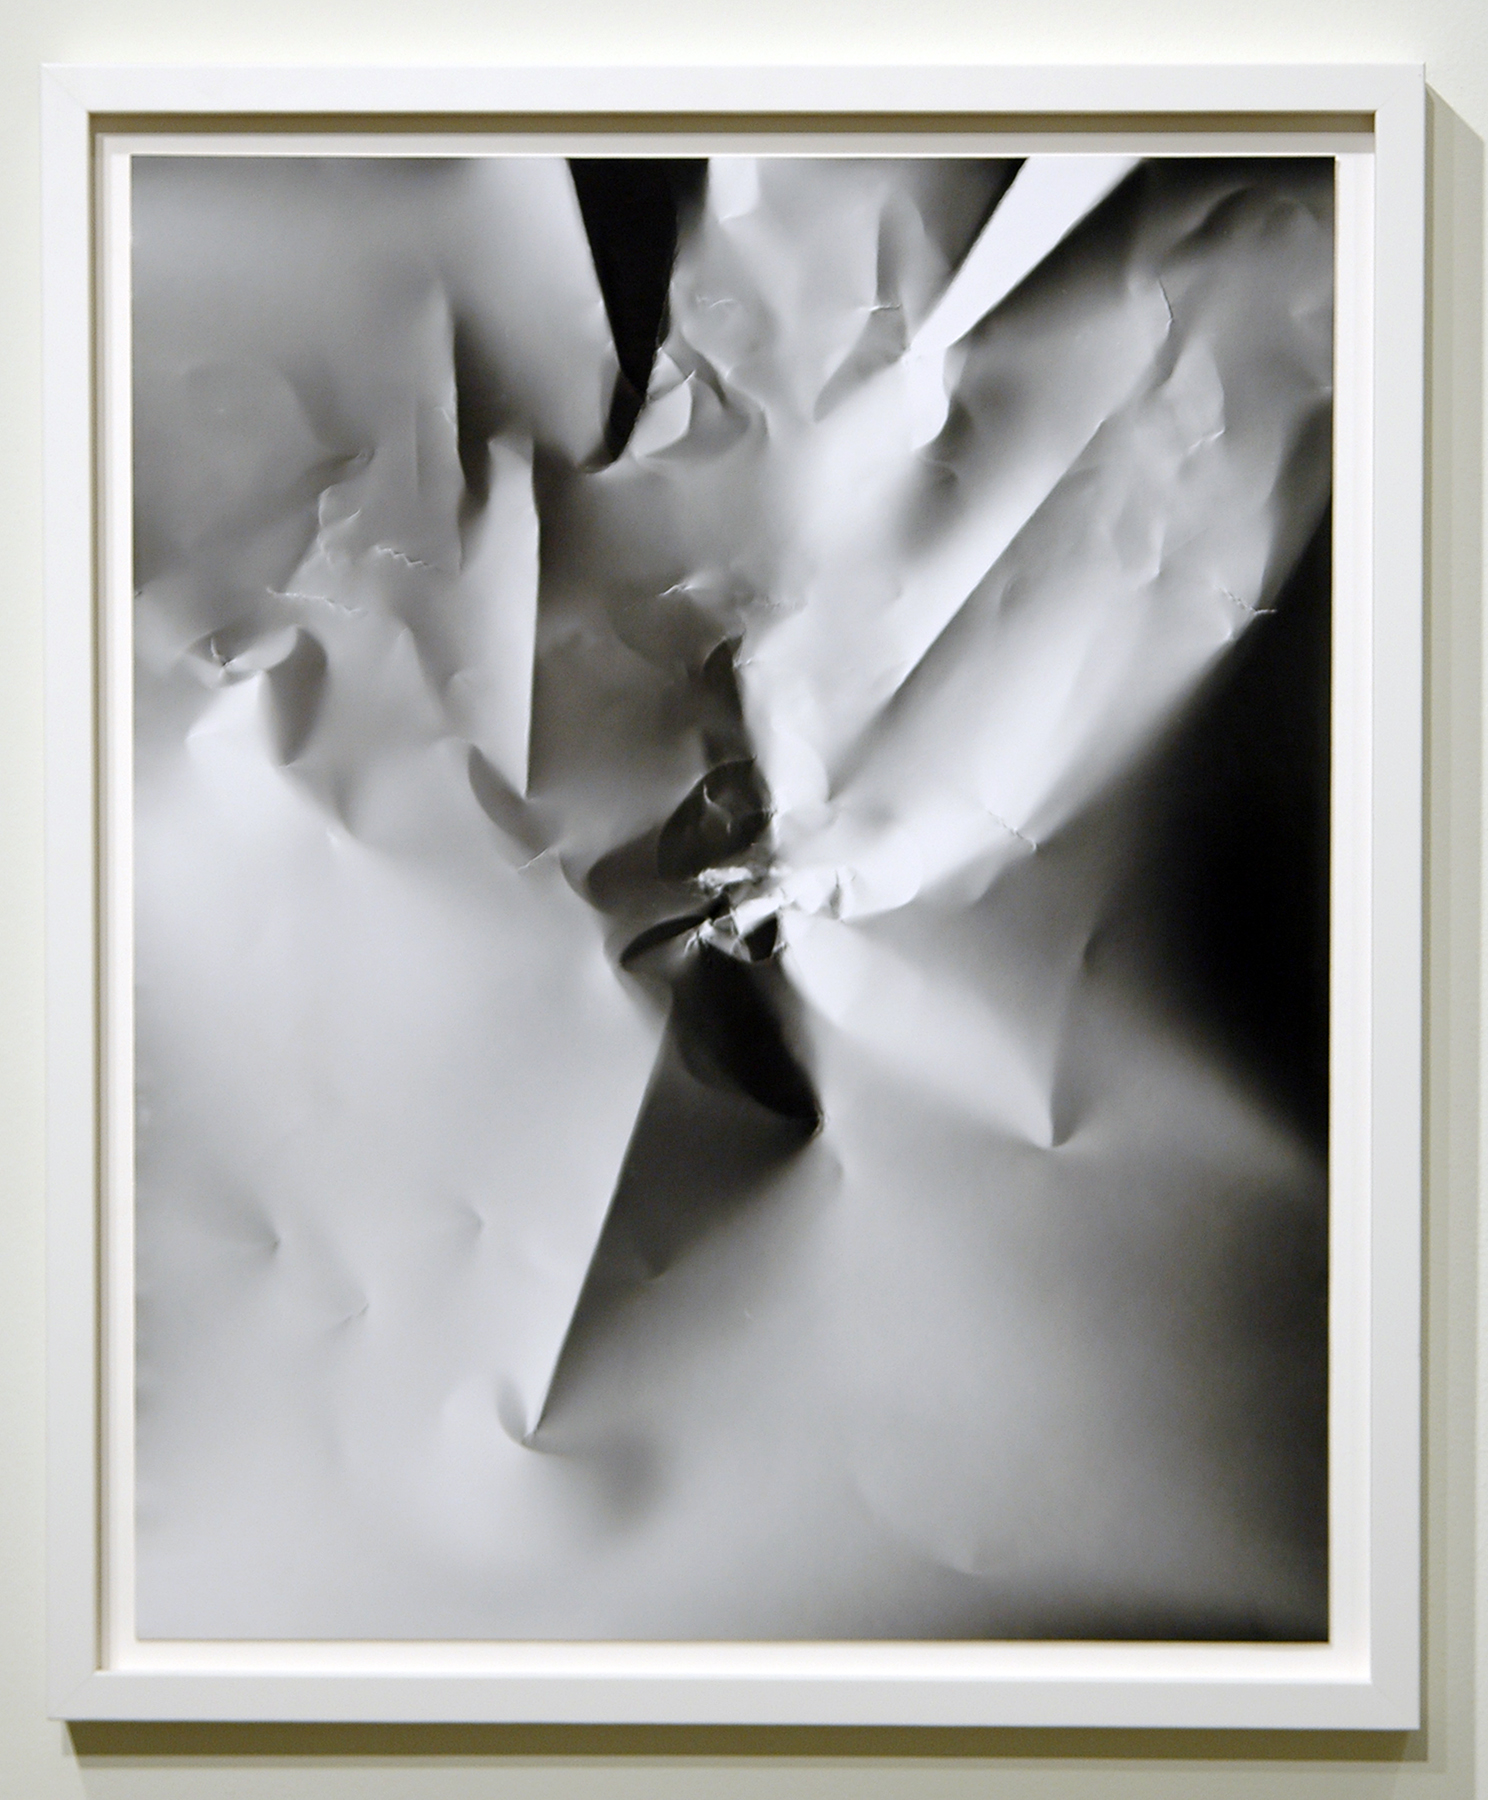 "WITH CINDER BLOCKS WE FLATTEN OUR PHOTOGRAPHS  C. Wright Daniel, Untitled (Profile Portrait) , unique silver gelatin print, 26.5"" x 22"", 2013"